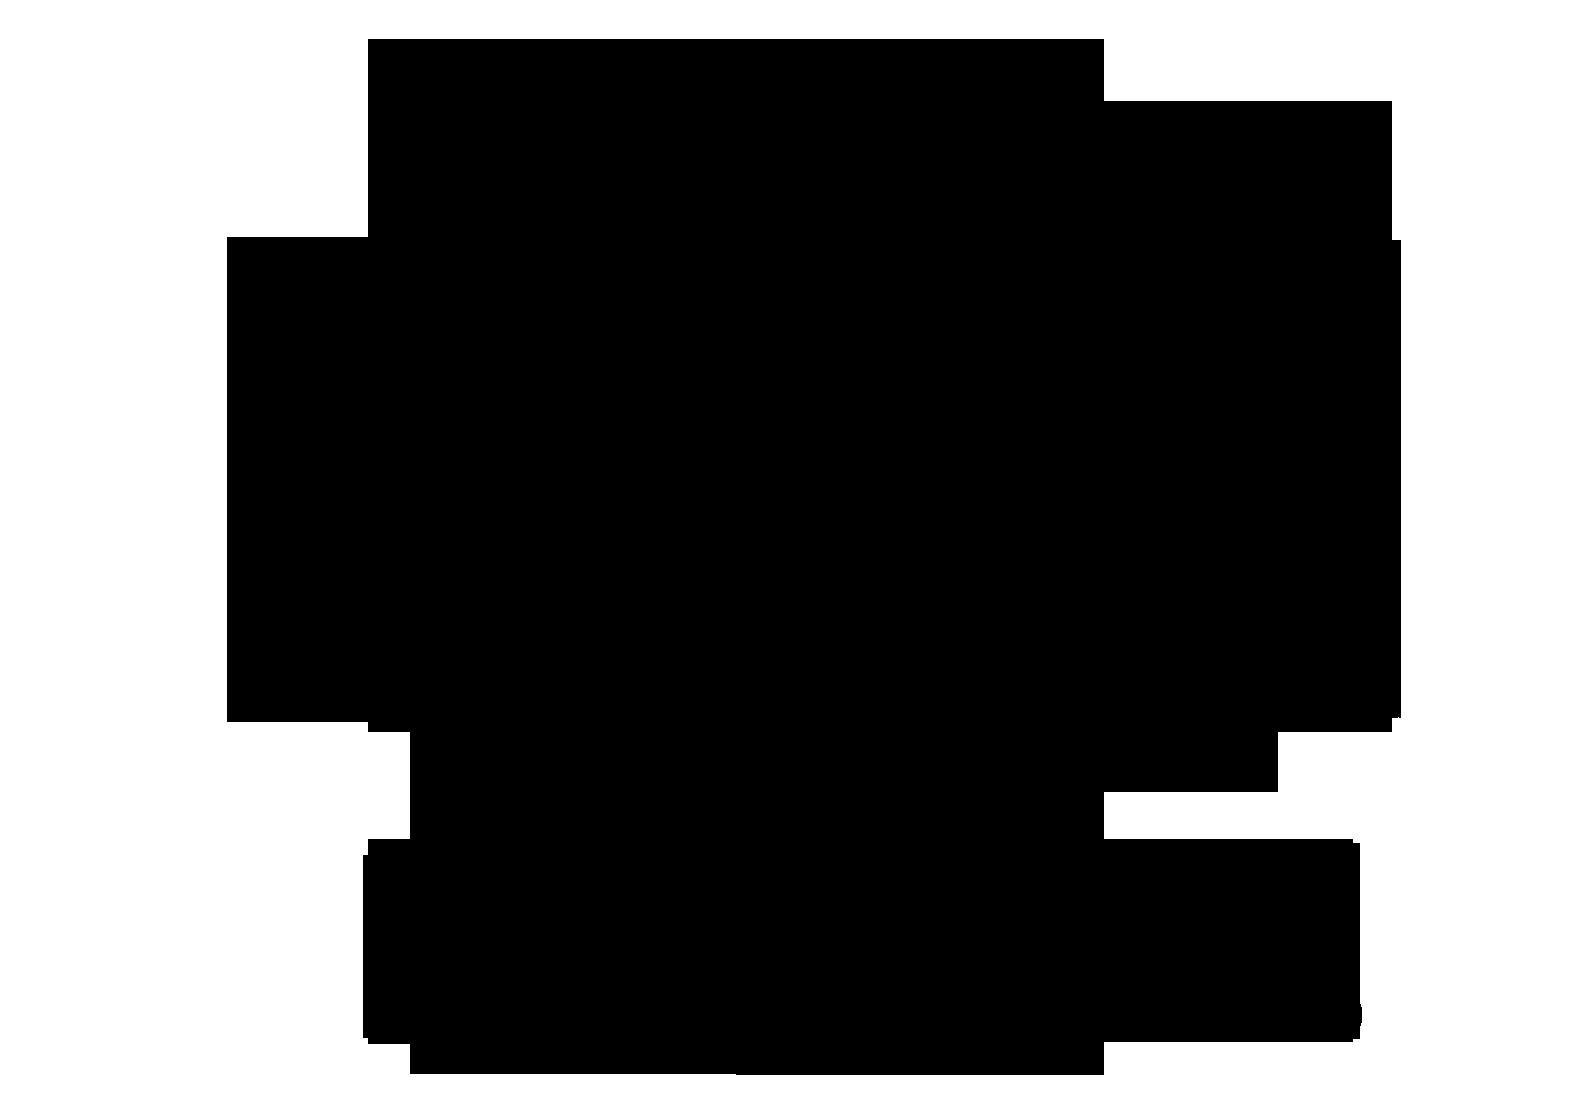 GYMNASIUM BECOMES OFFICIALLY A GYMNASIUM AGAIN